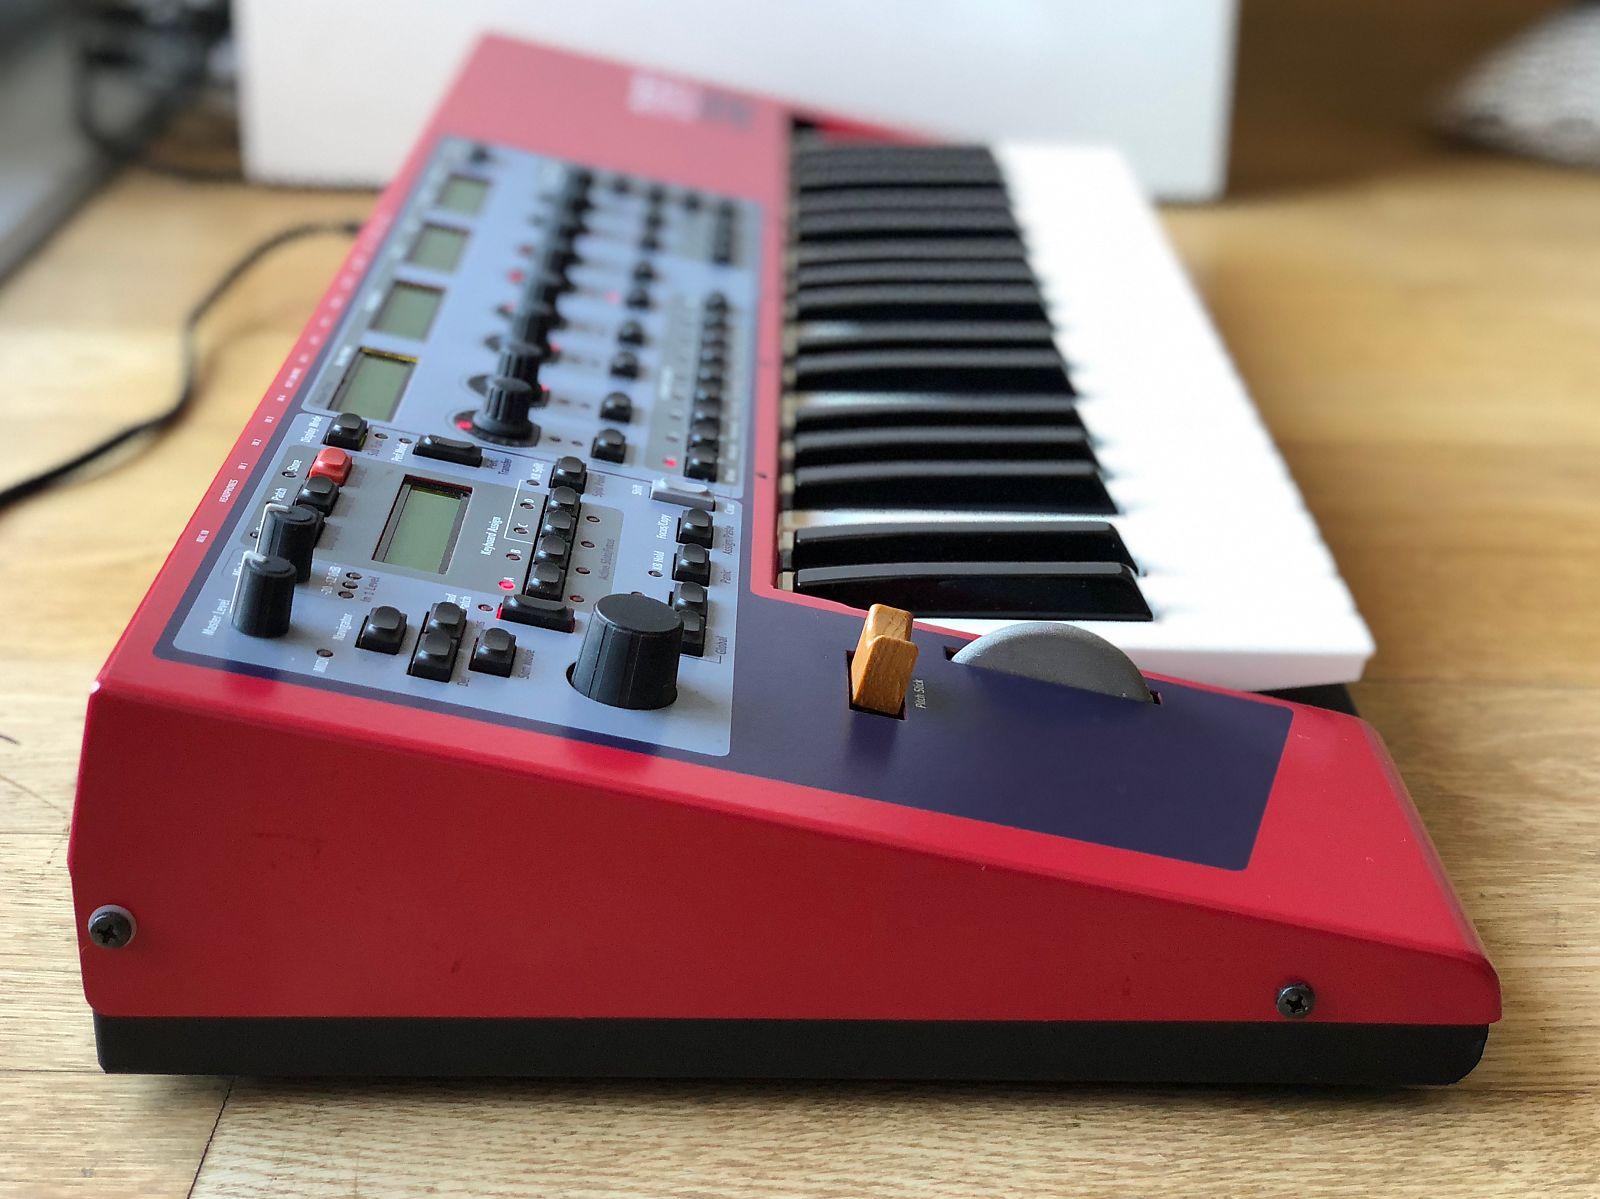 matrixsynth nord modular g2 keyboard modular synthesizer. Black Bedroom Furniture Sets. Home Design Ideas